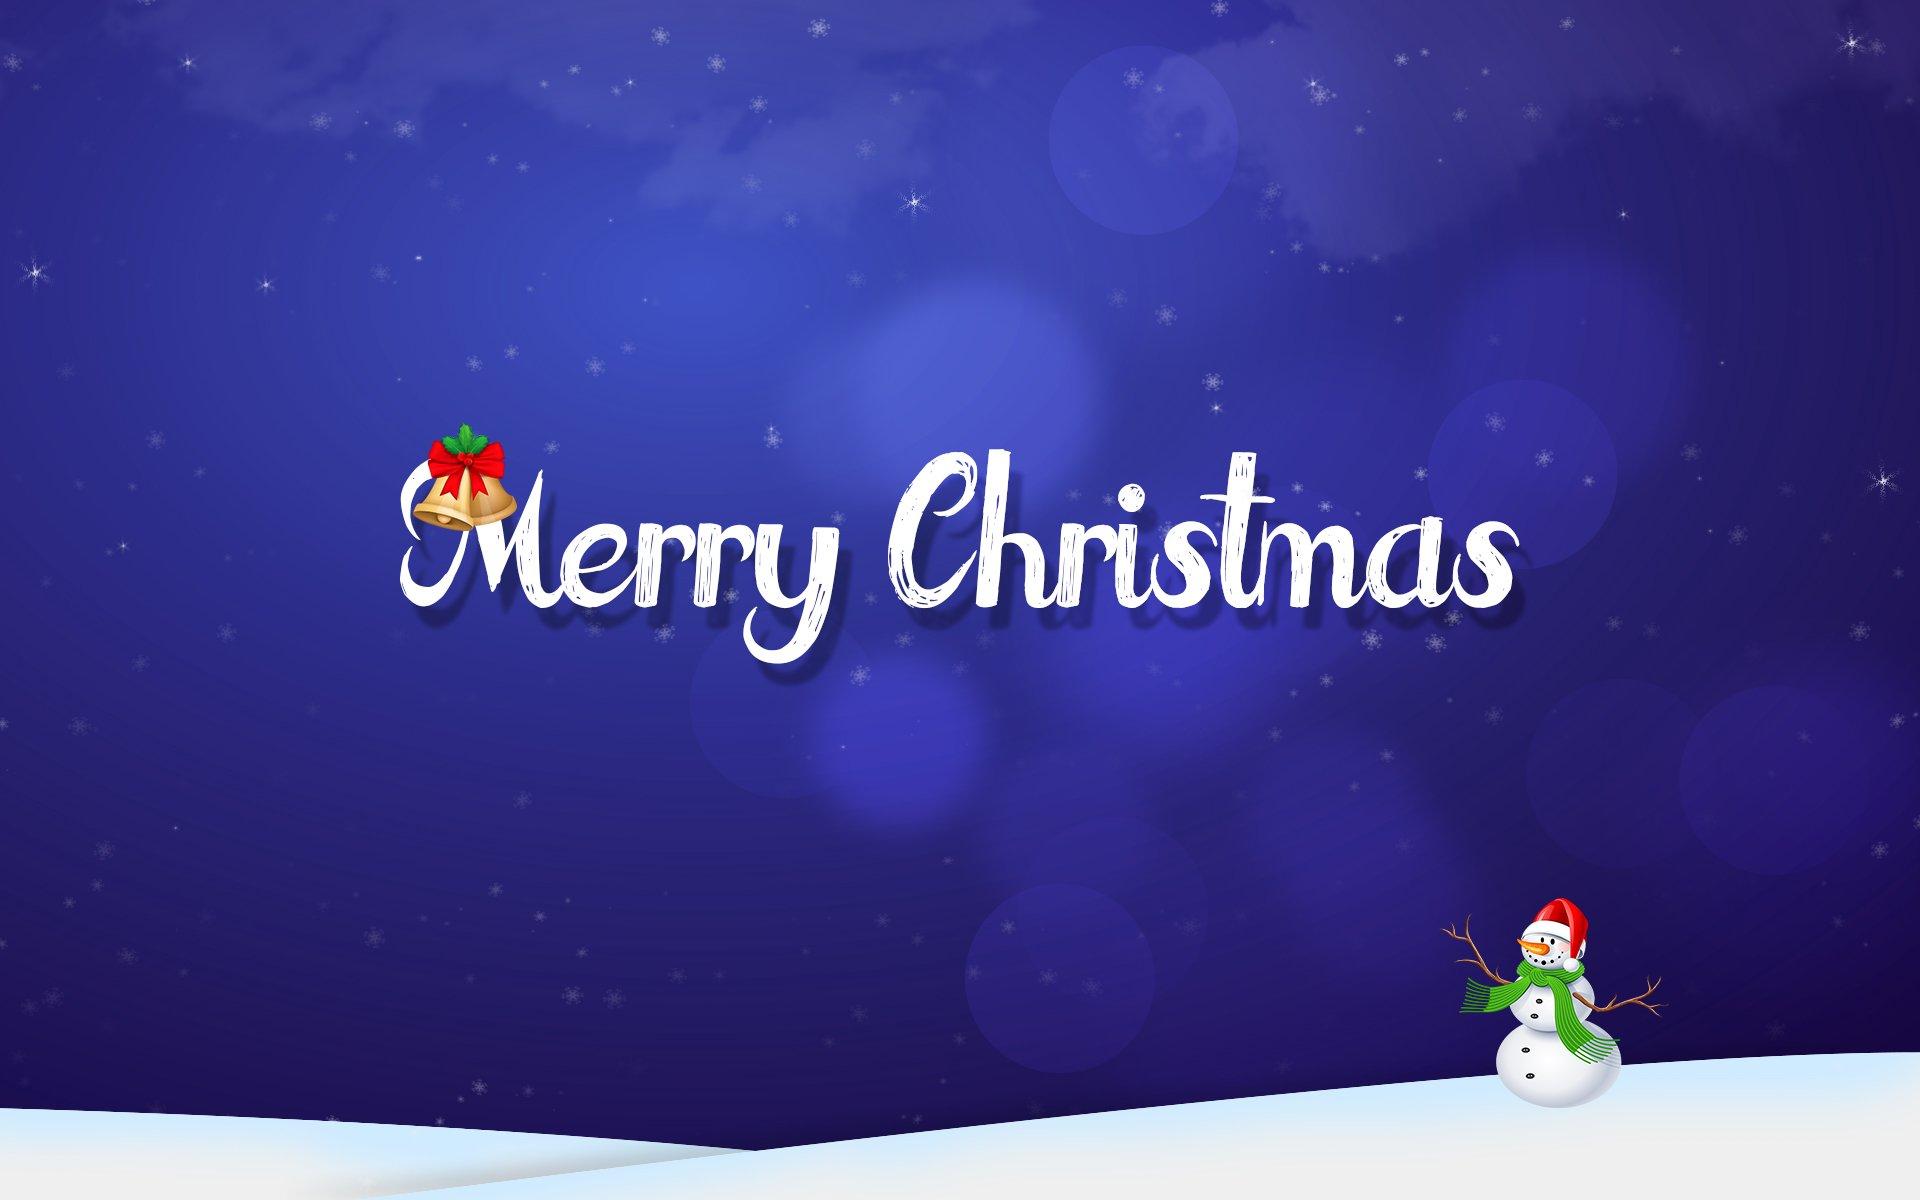 Christmas Greetings Wallpapers